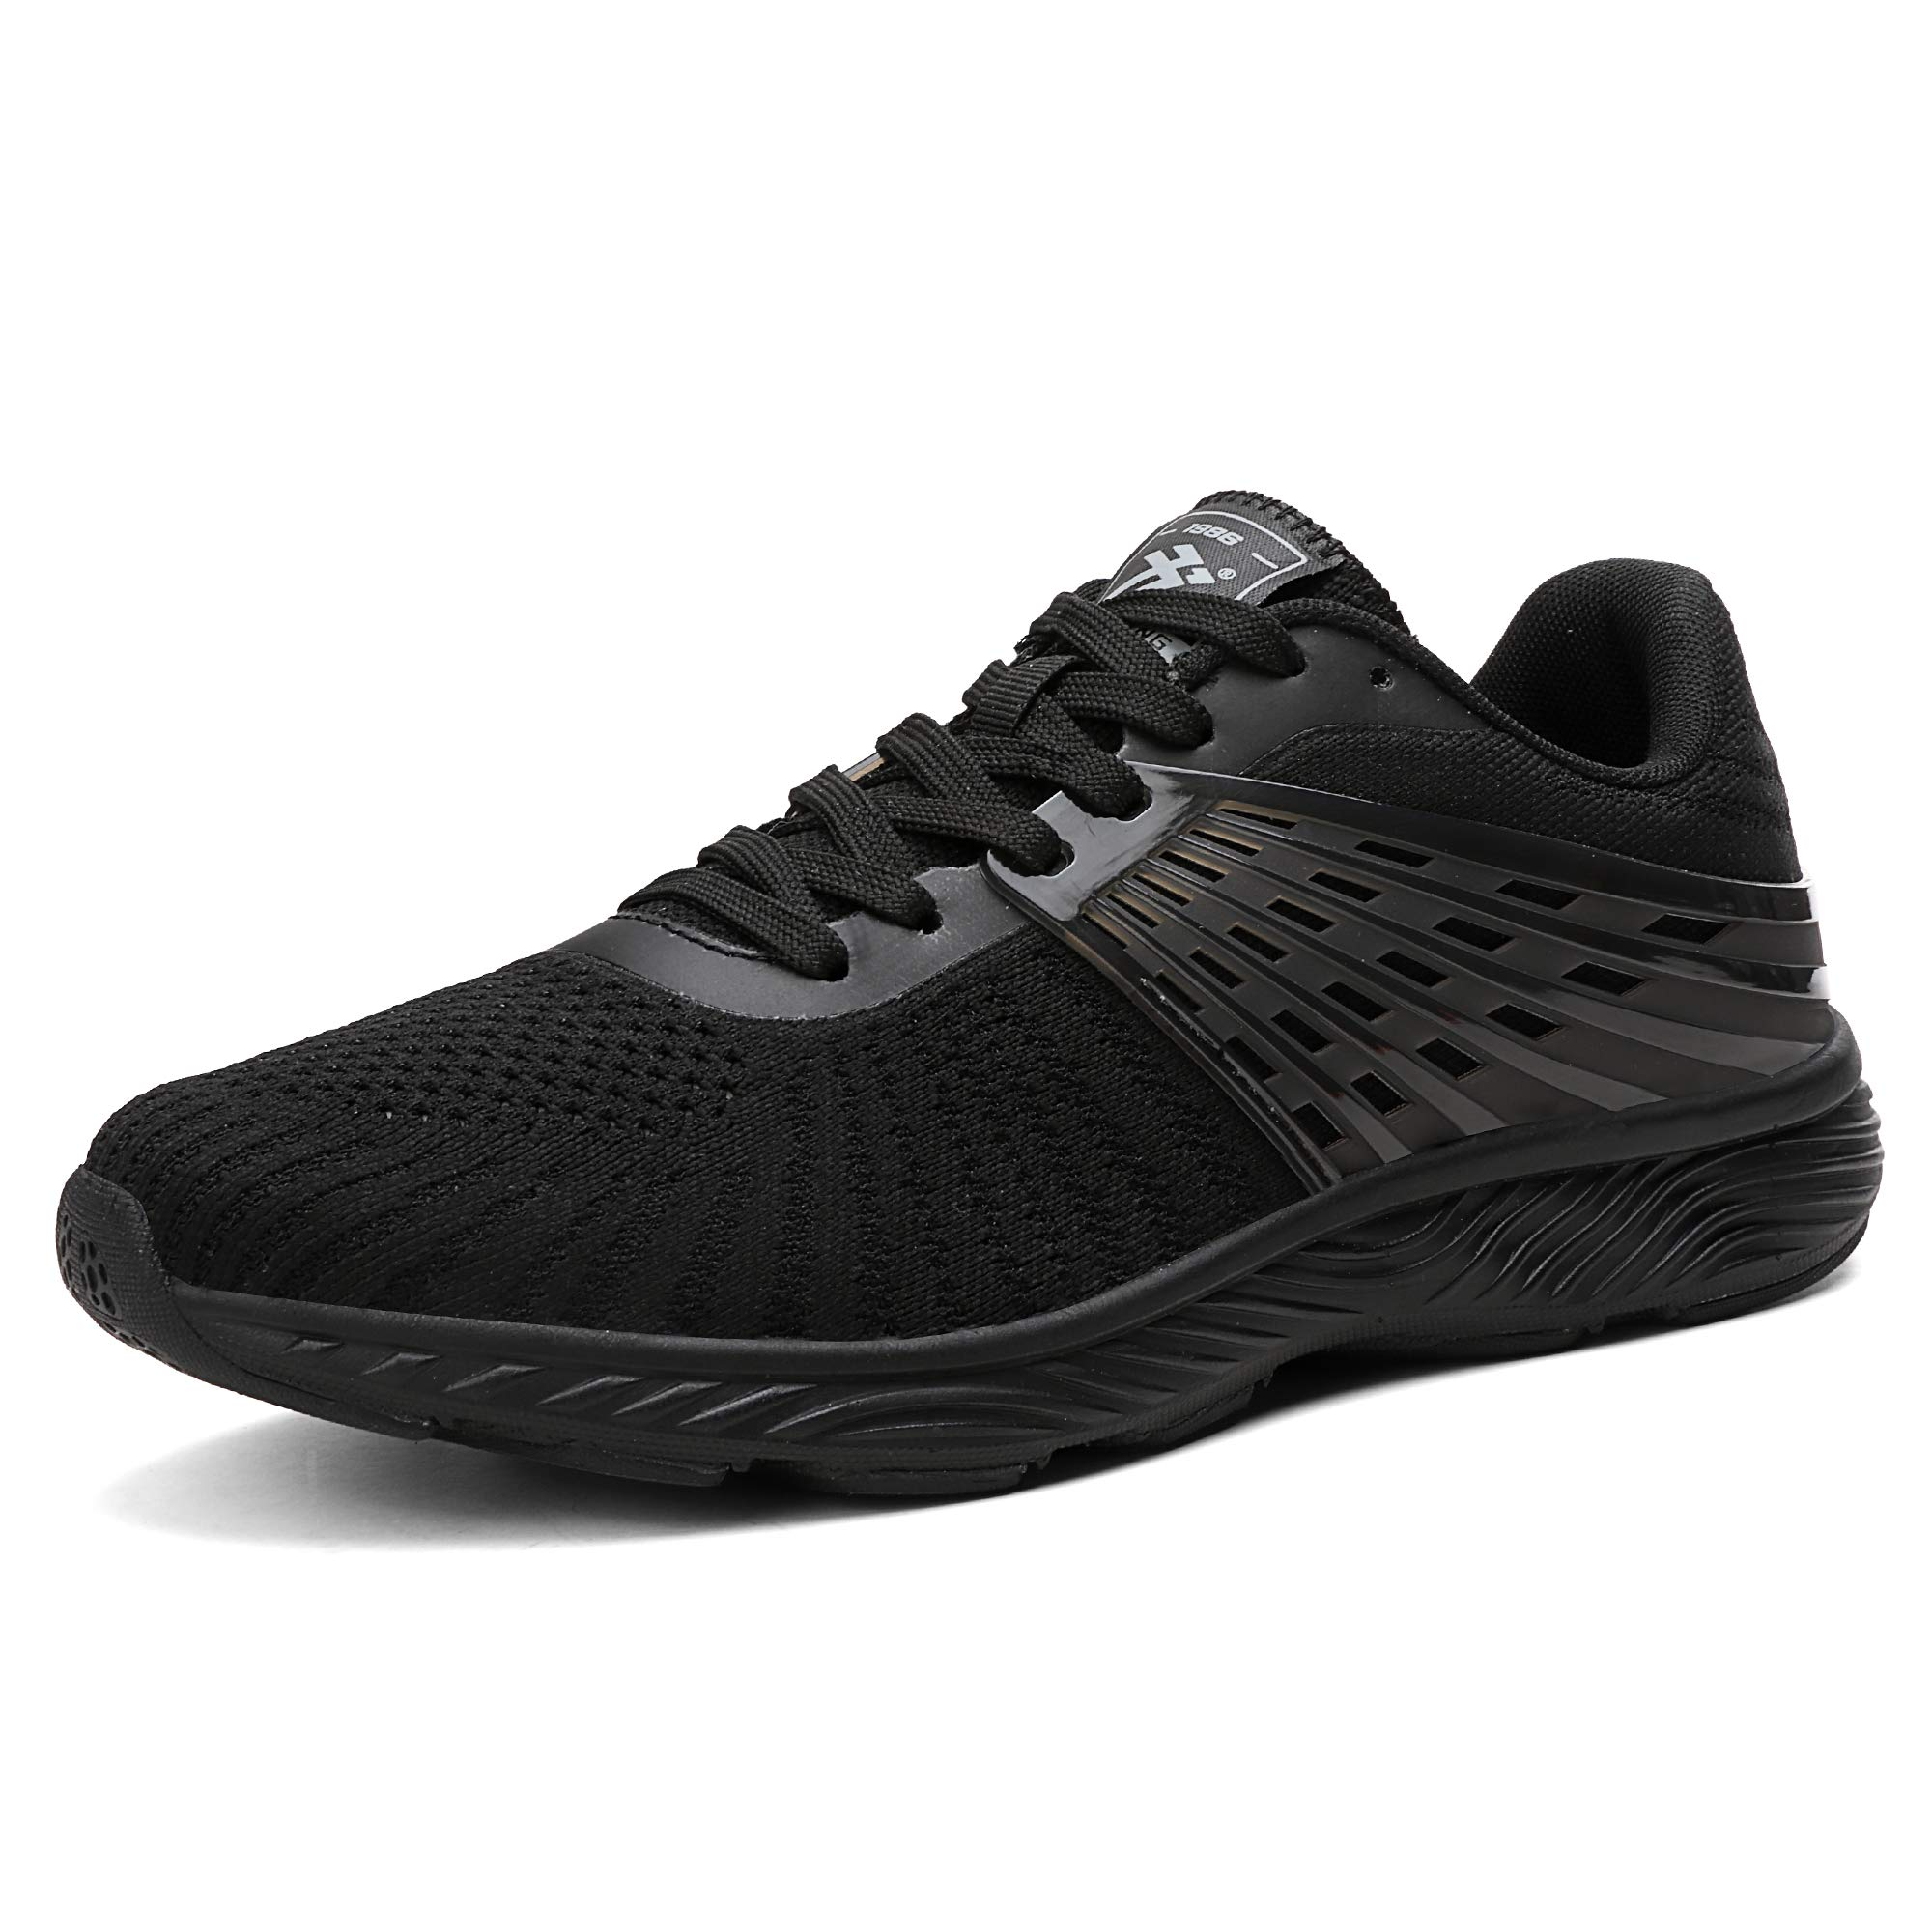 23687f29da1 AX BOXING Zapatillas Hombres Deporte Running Sneakers Zapatos para Correr  Gimnasio Deportivas Padel Transpirables Casual 40